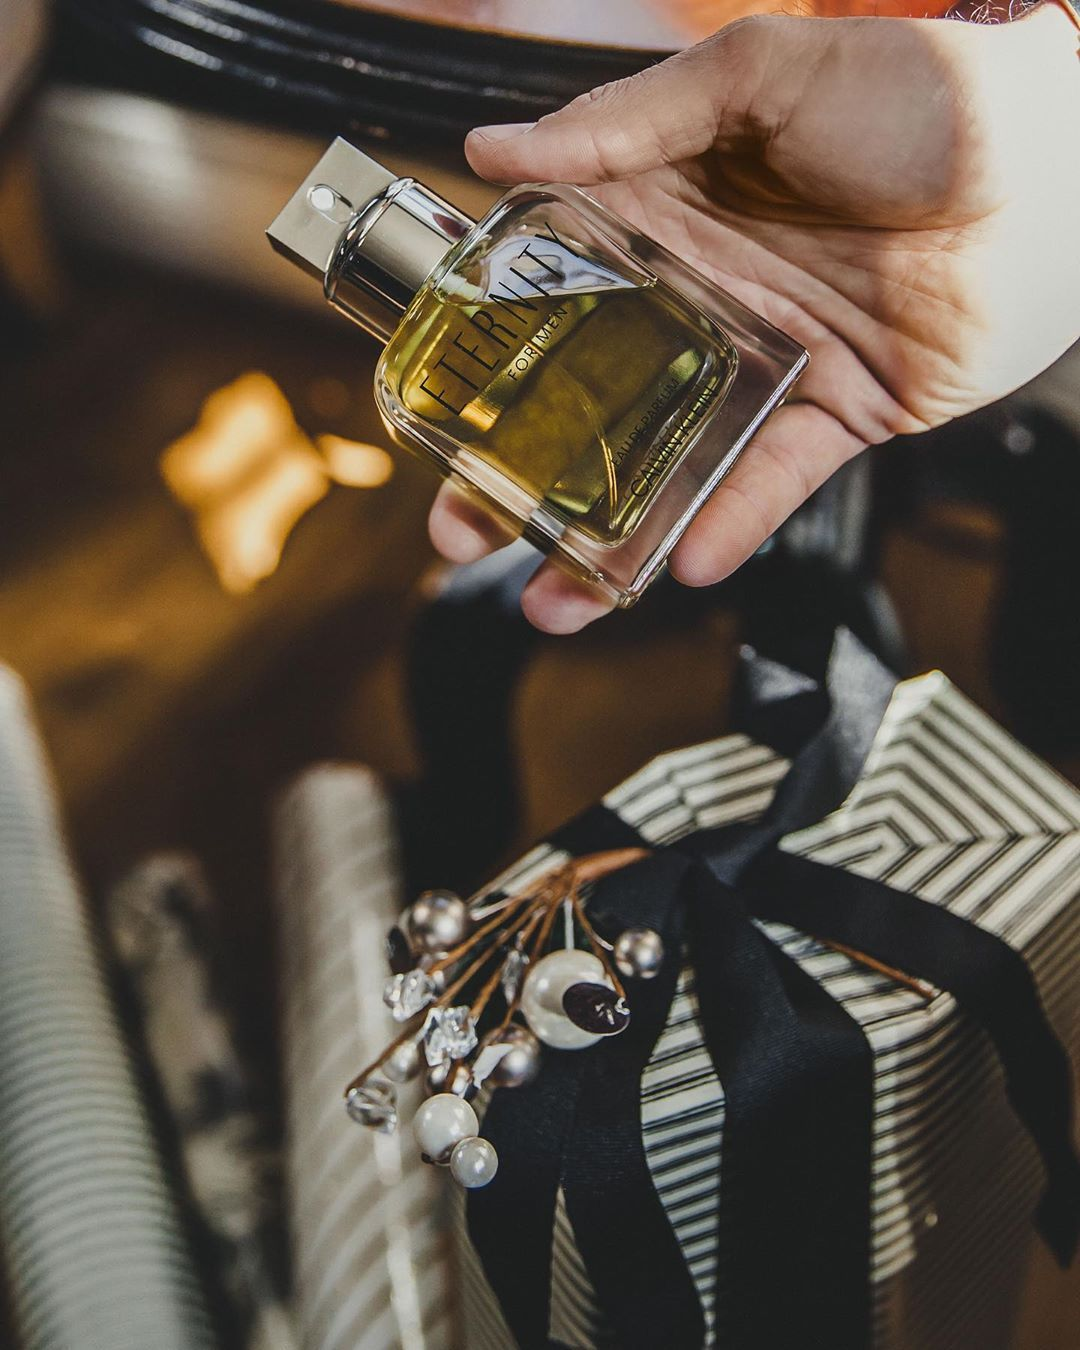 Eternity For Men Eau De Parfum Calvin Klein Christian Dior Perfume Perfume Hacks Lavender Perfume